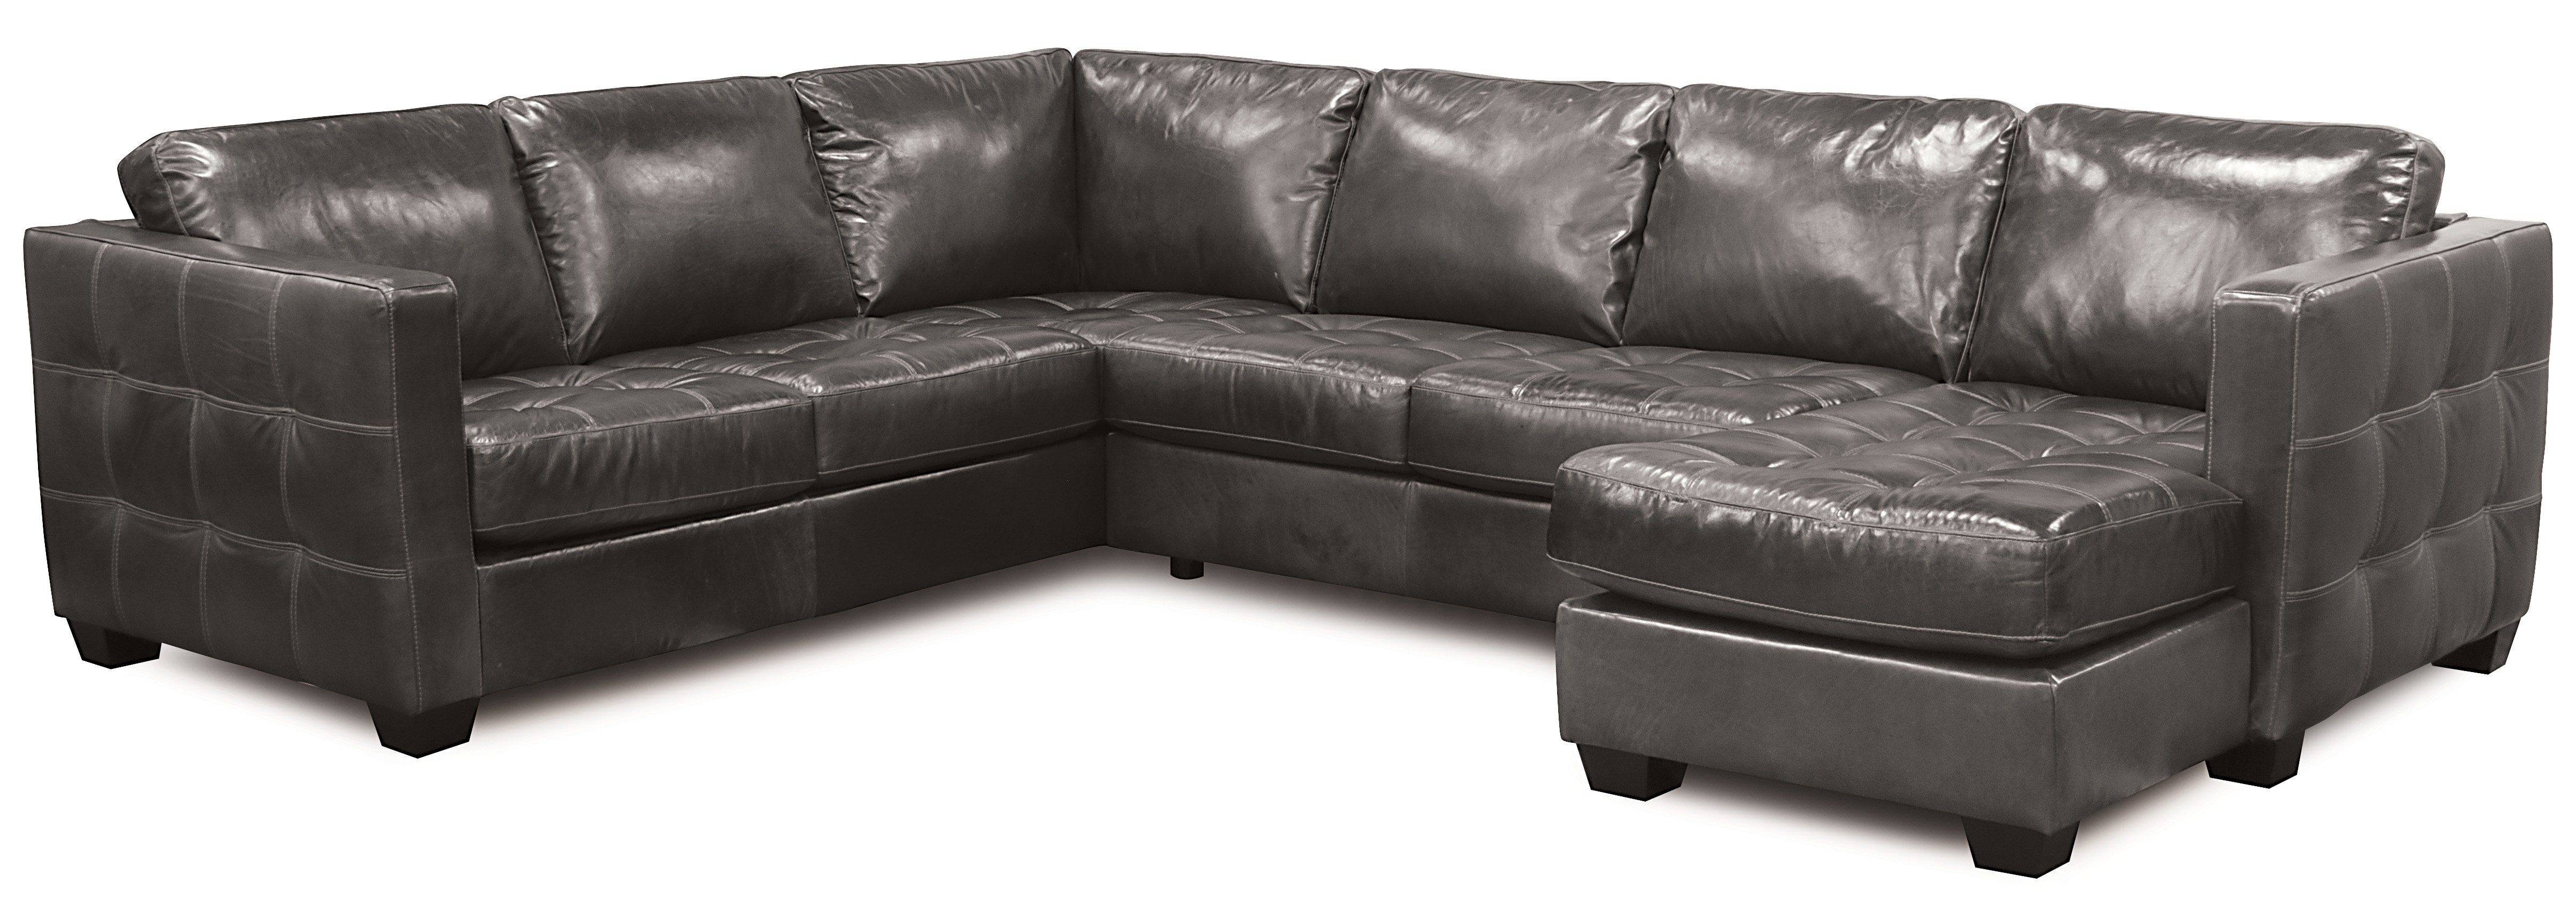 Cool Barrett 77558 70558 Sectional 350 Fabrics Sofas And Ibusinesslaw Wood Chair Design Ideas Ibusinesslaworg